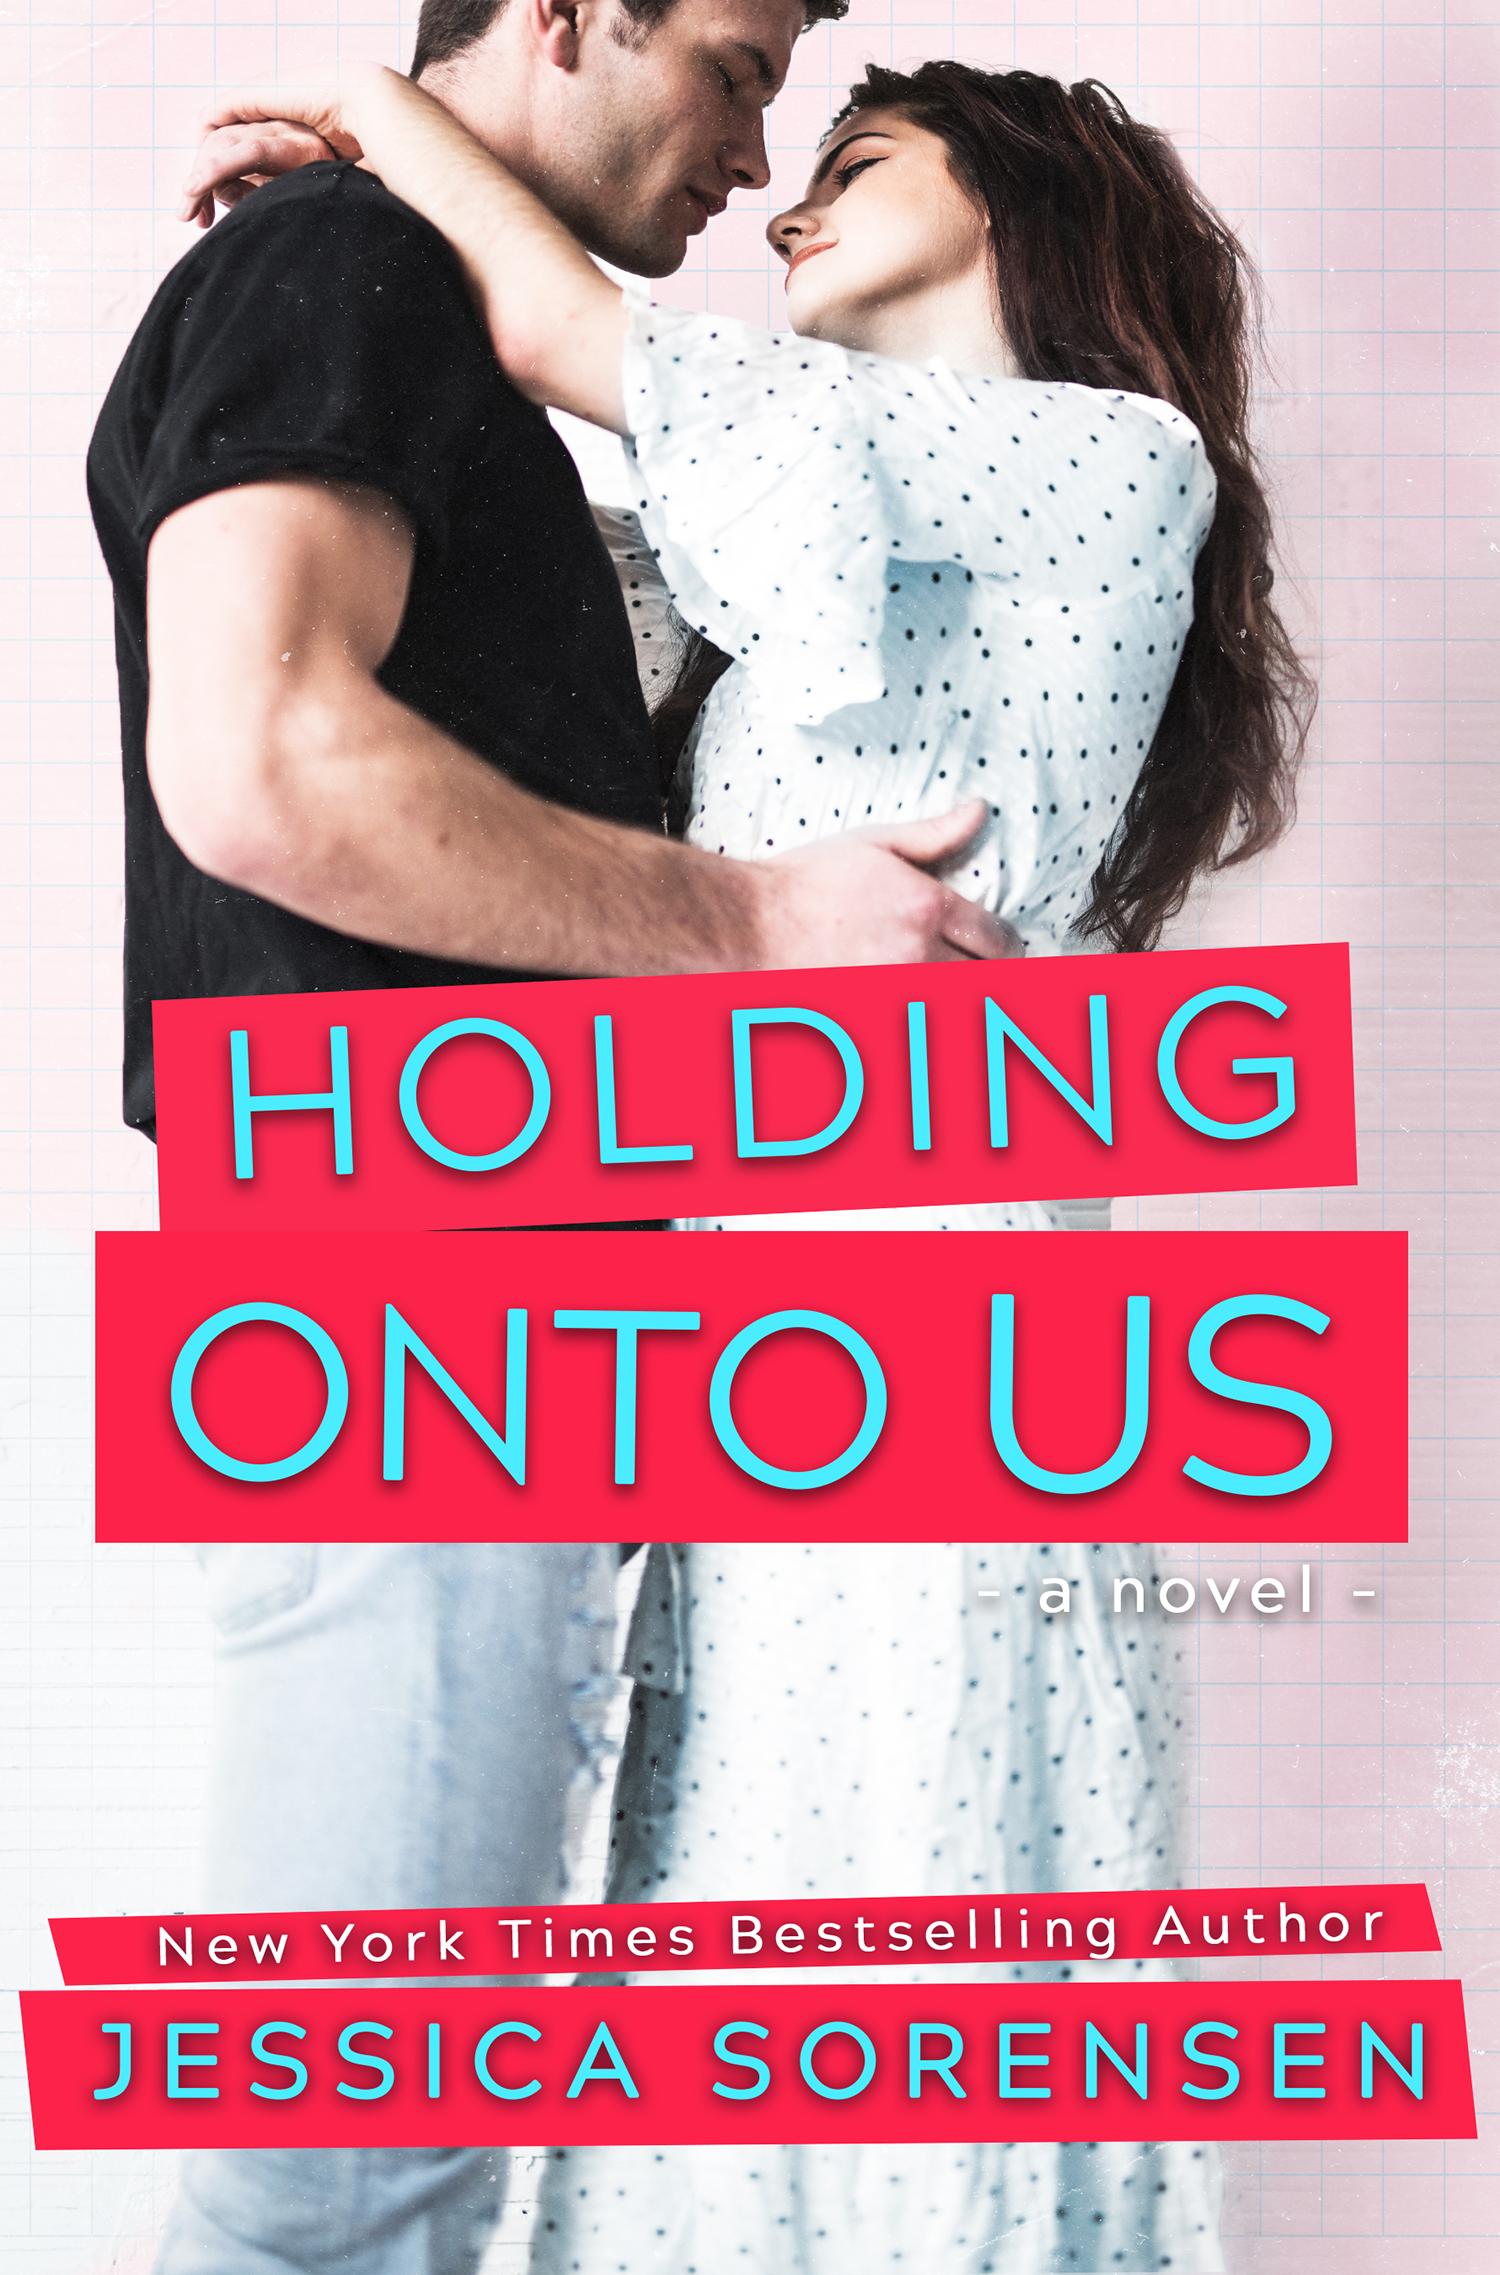 HoldingontoUs-FINAL-ebooklg